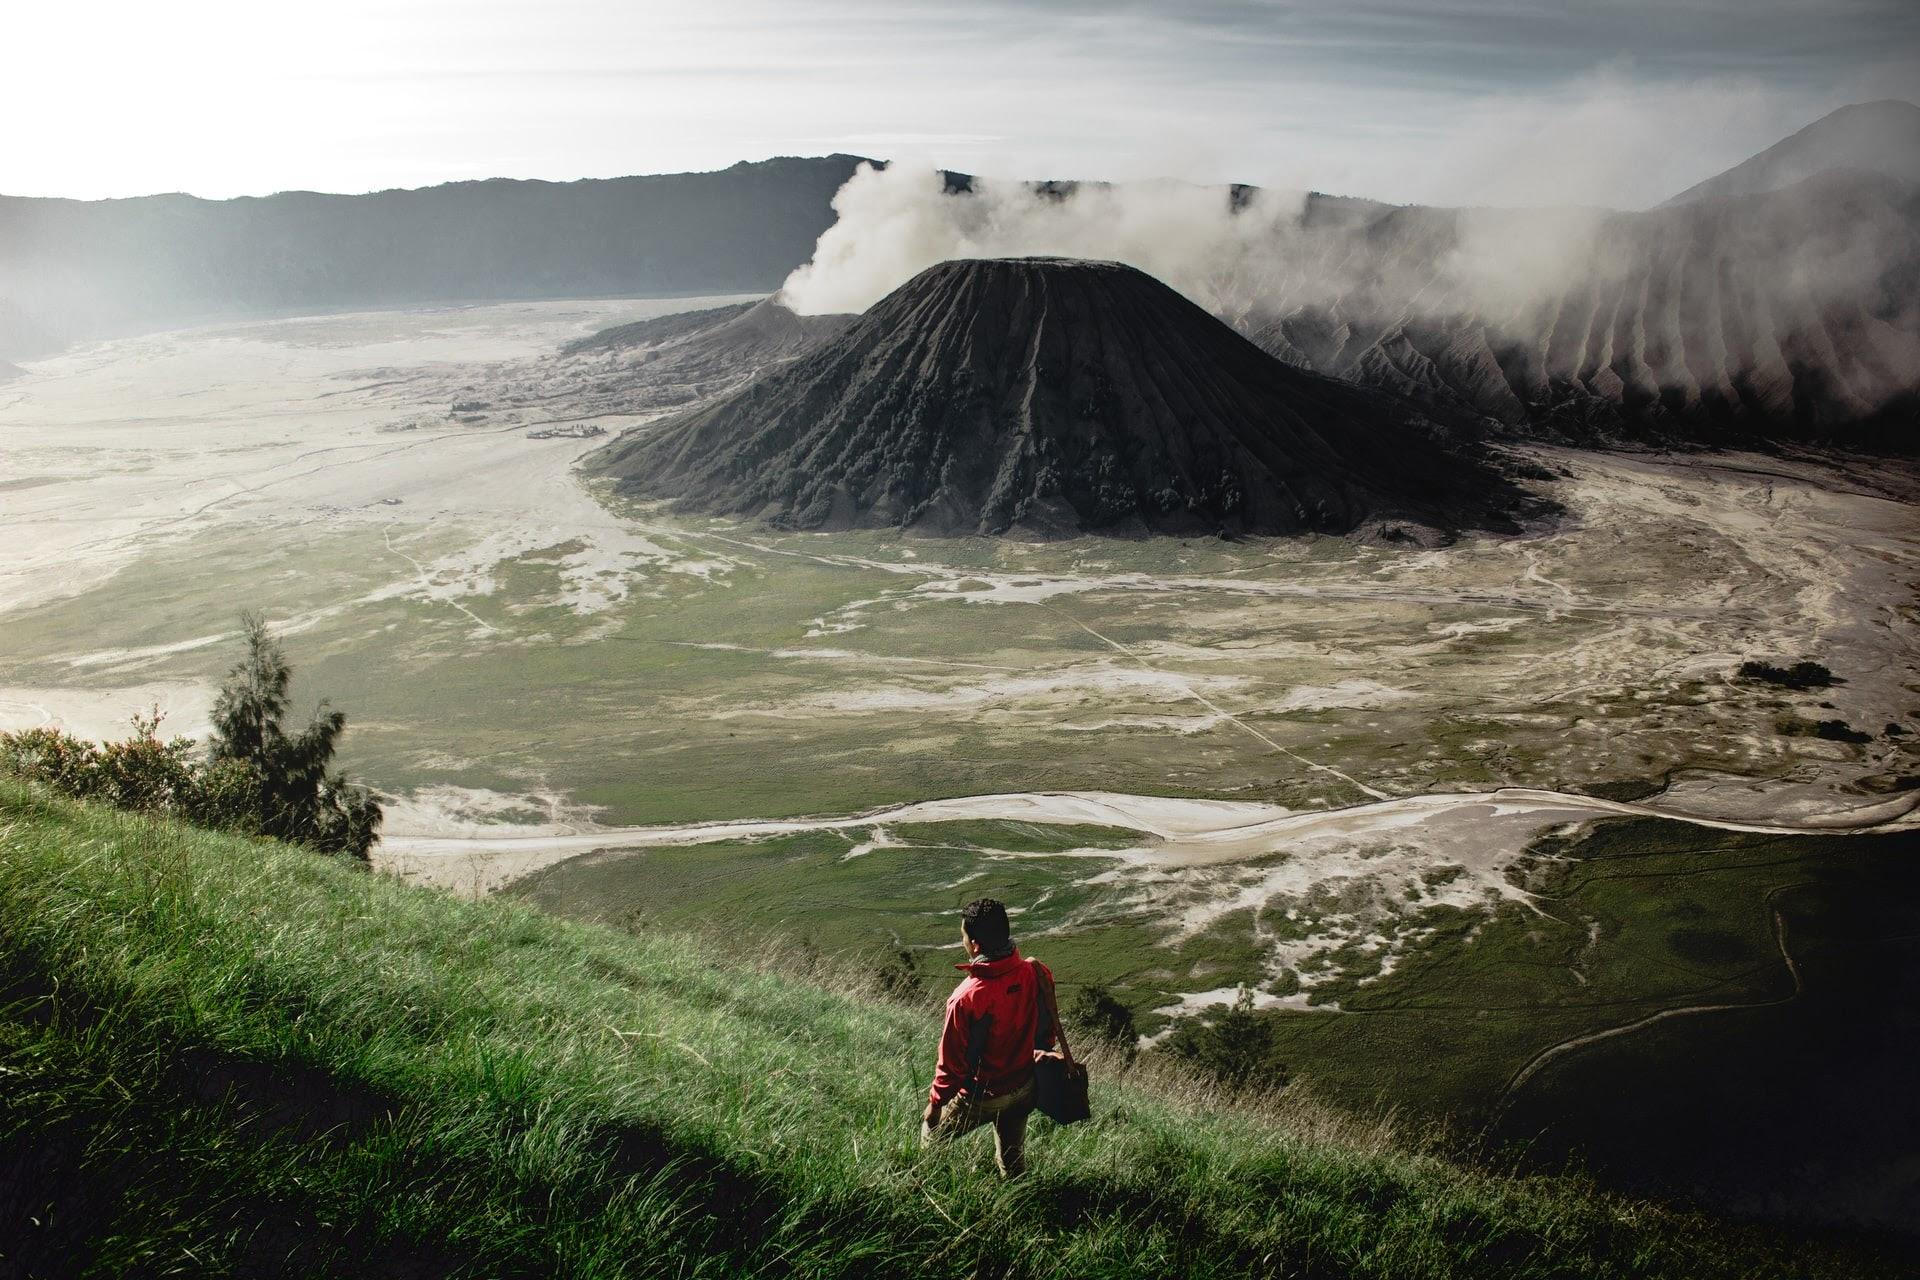 A man walking along a mountainside